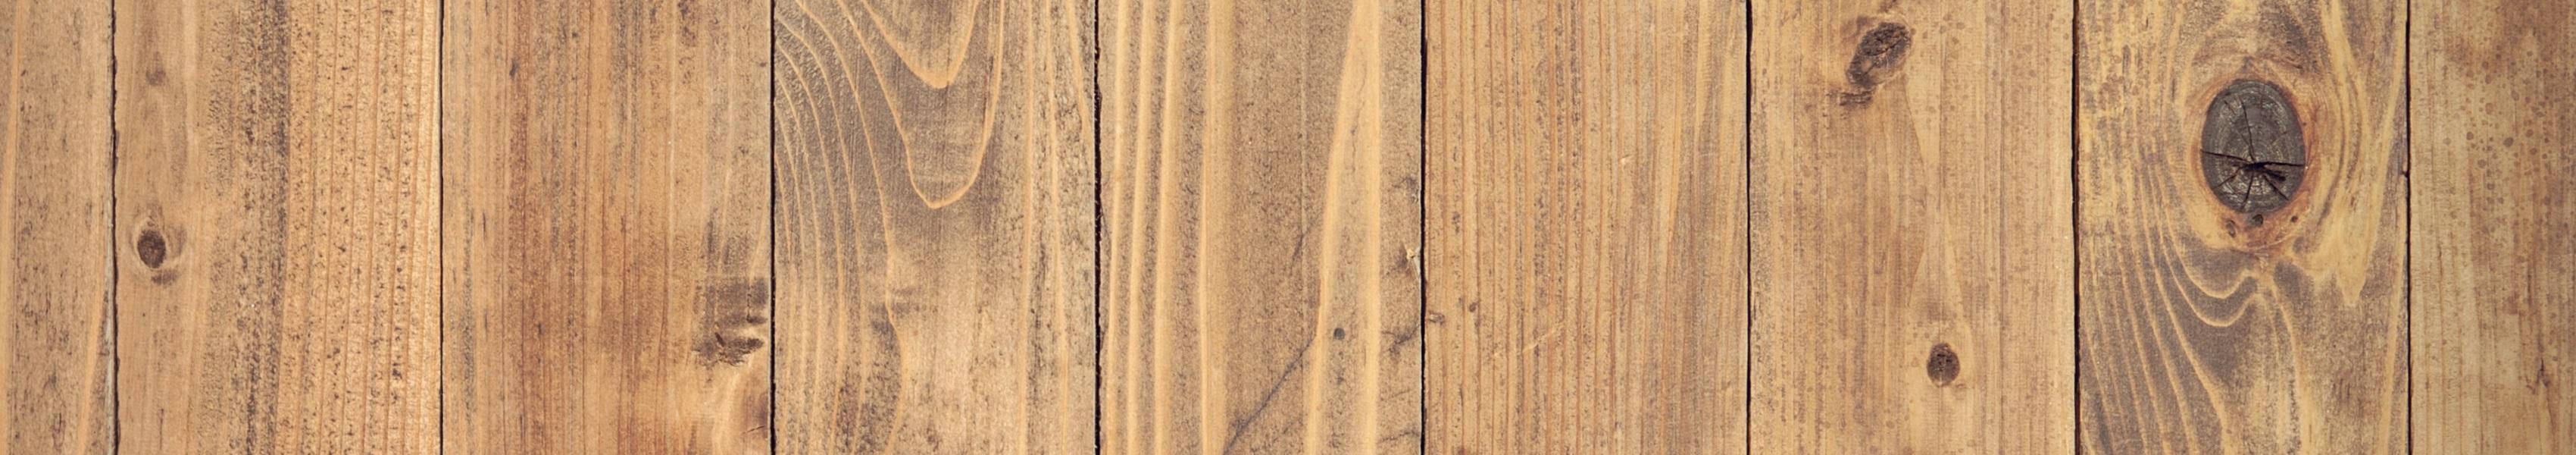 115mm X 25mm (4.5 X 1.5) Timber